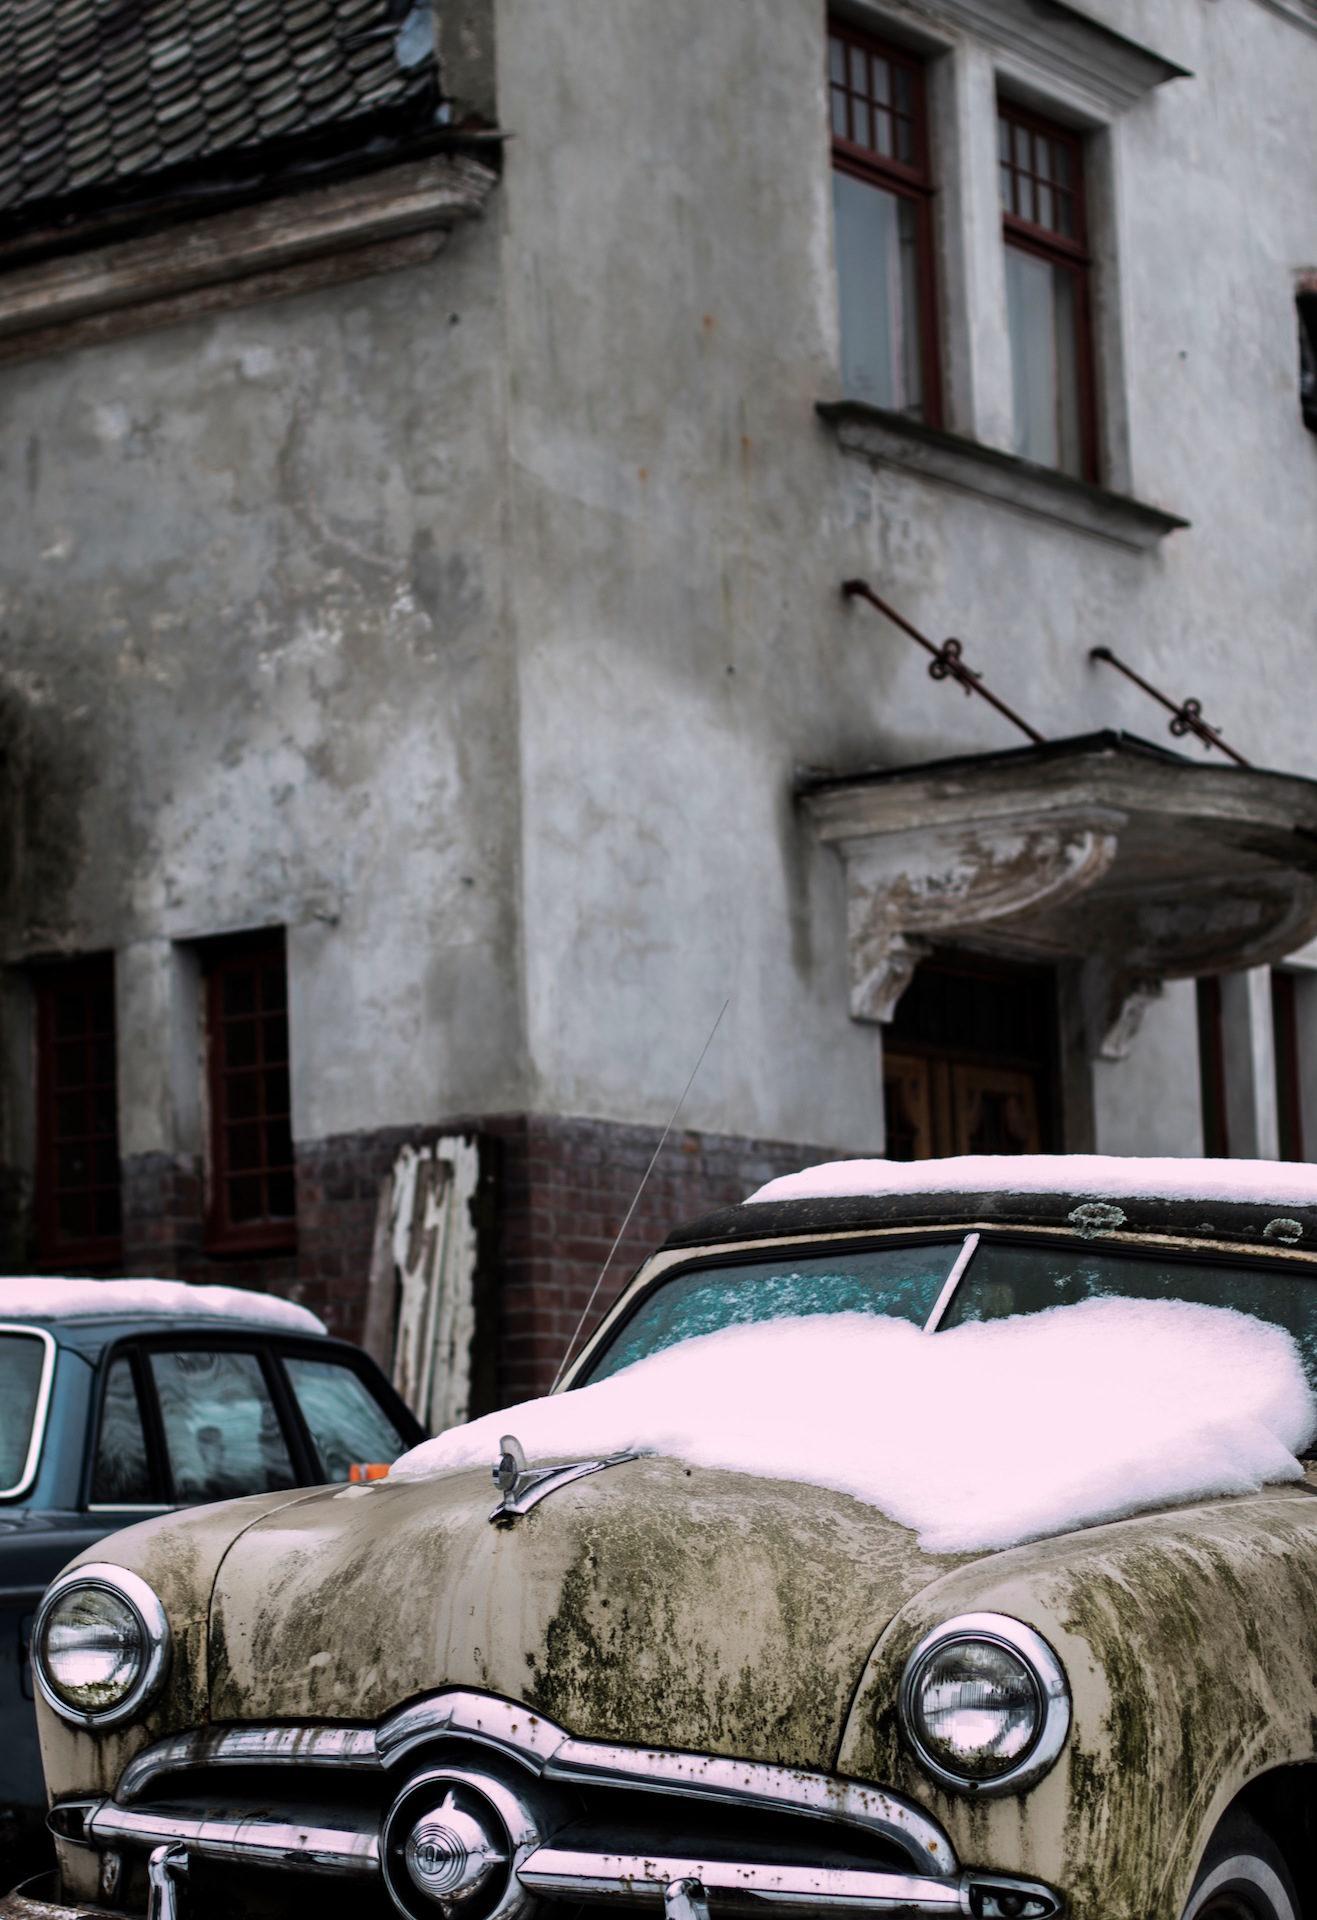 Auto, Schnee, Haus, alt, Jahrgang - Wallpaper HD - Prof.-falken.com